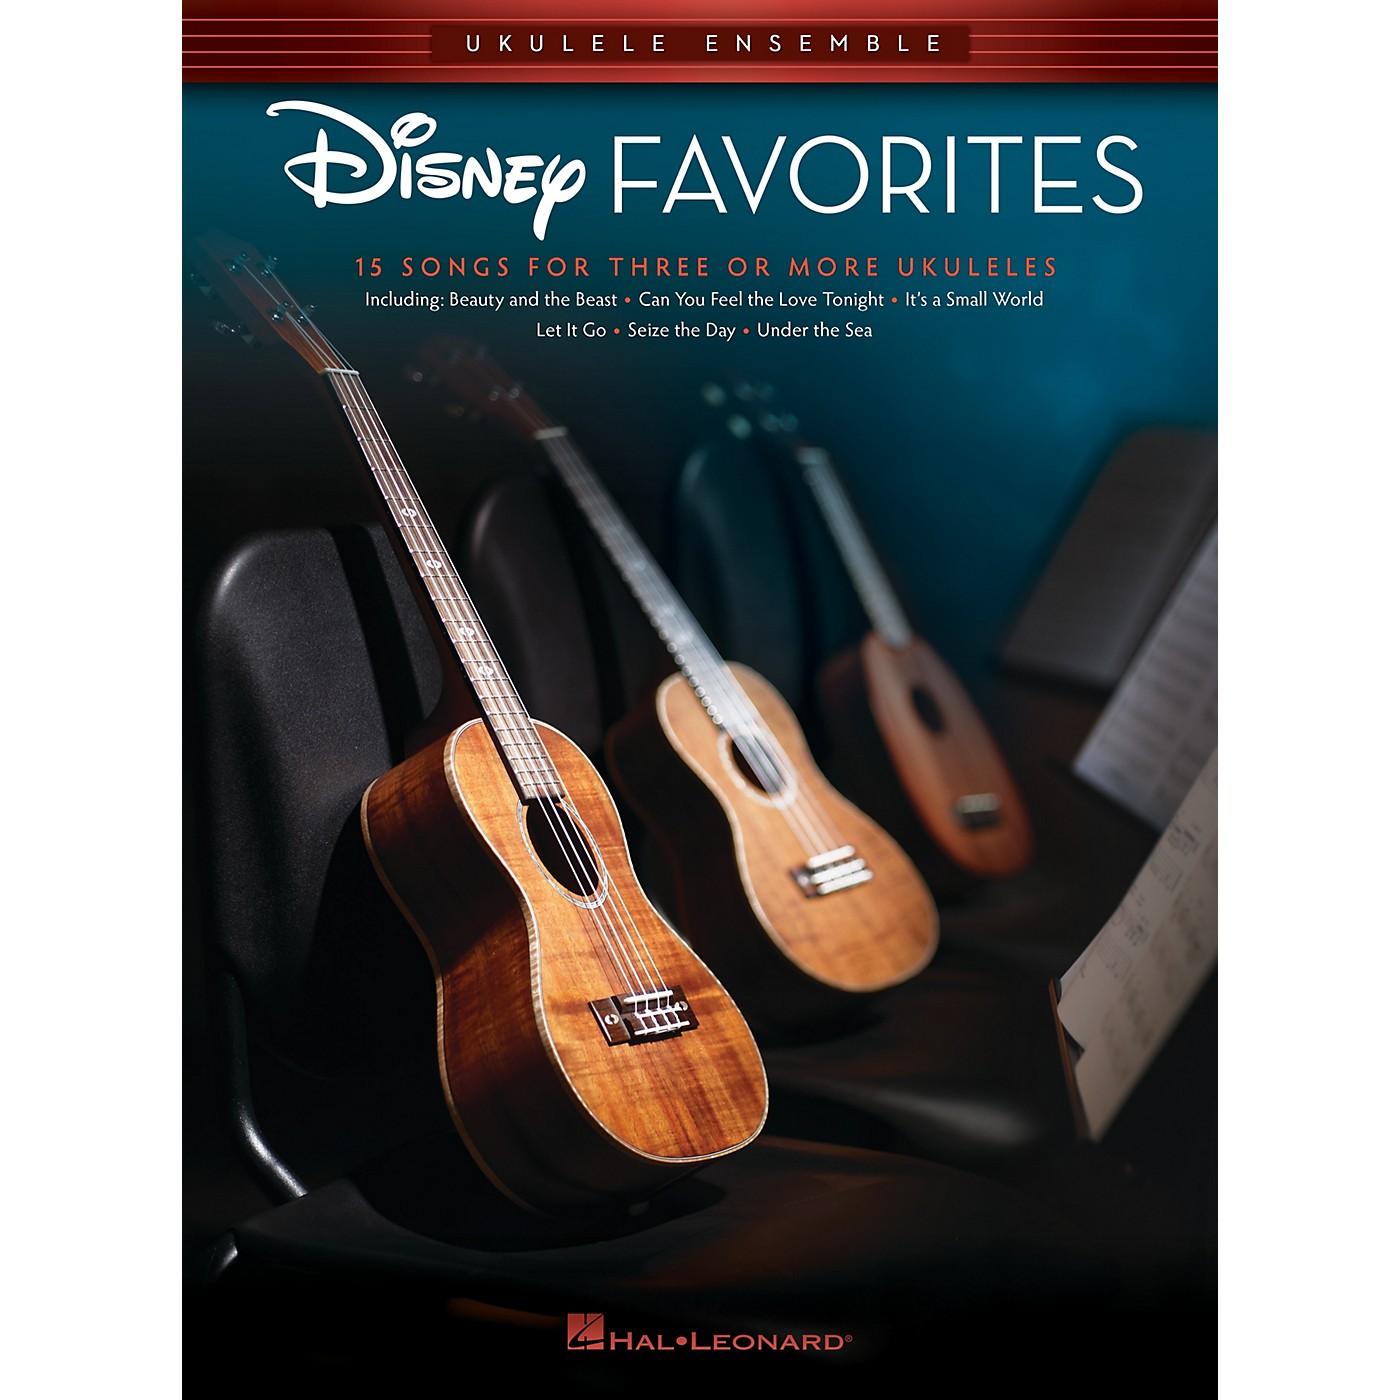 Hal Leonard Disney Favorites (Ukulele Ensembles Early Intermediate) Ukulele Ensemble Songbook thumbnail